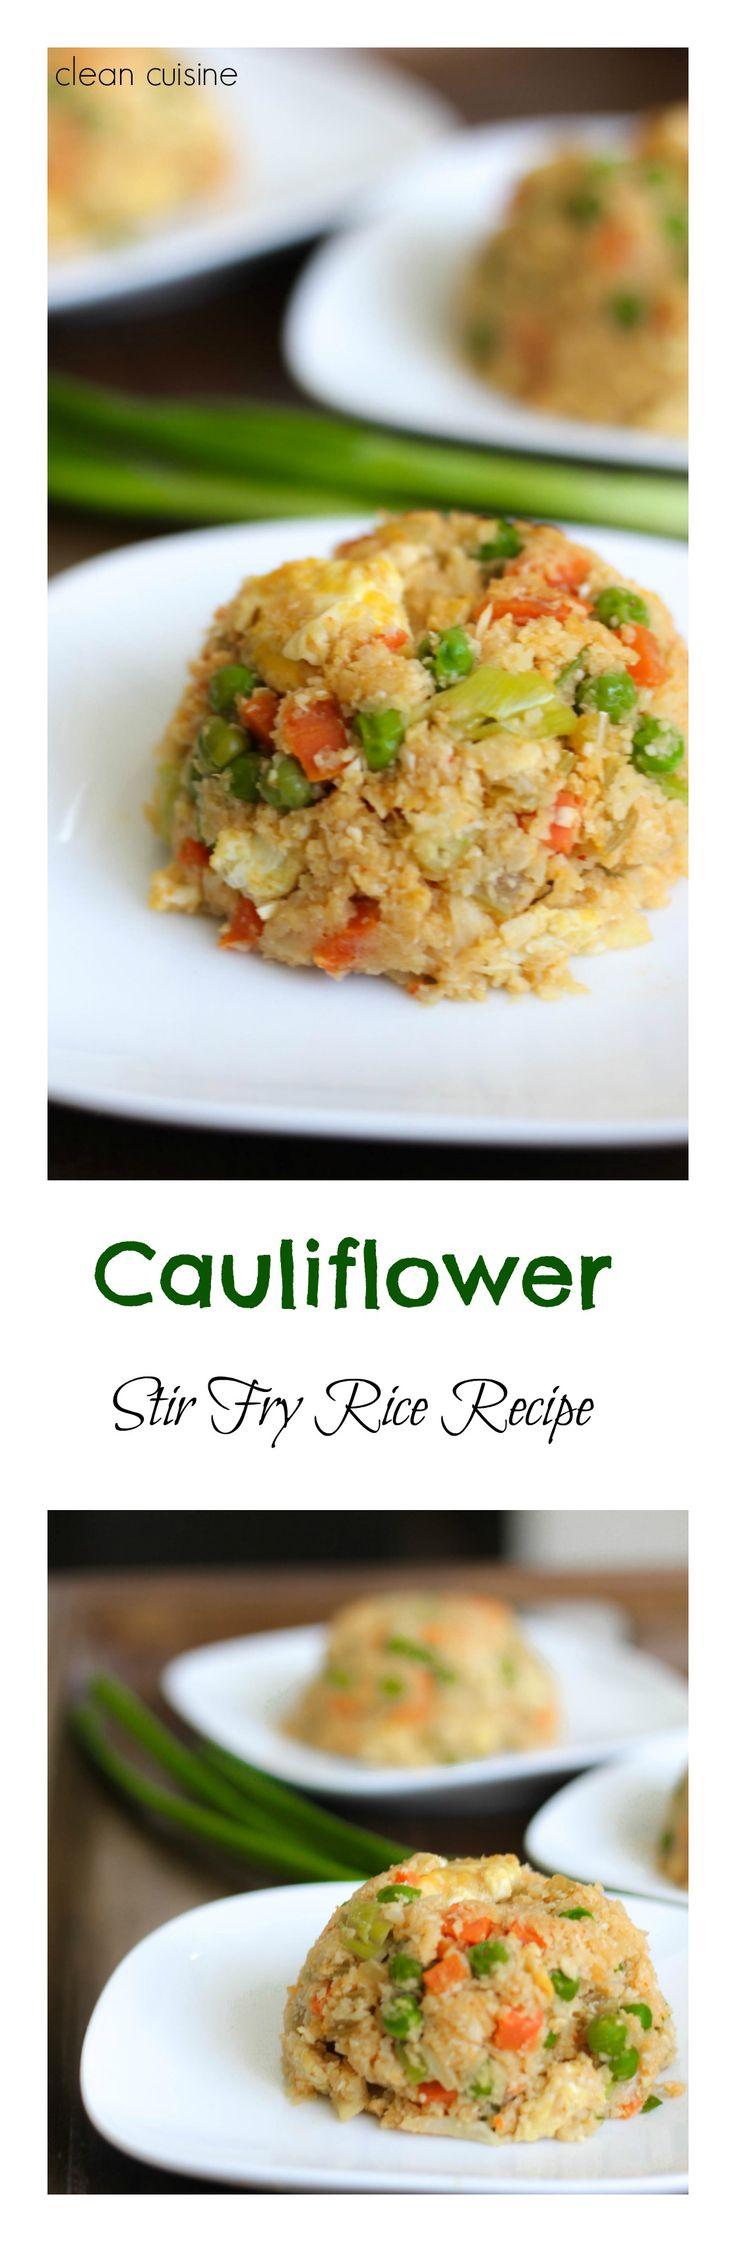 Grain-Free Chinese-Style Cauliflower Stir Fry Rice!